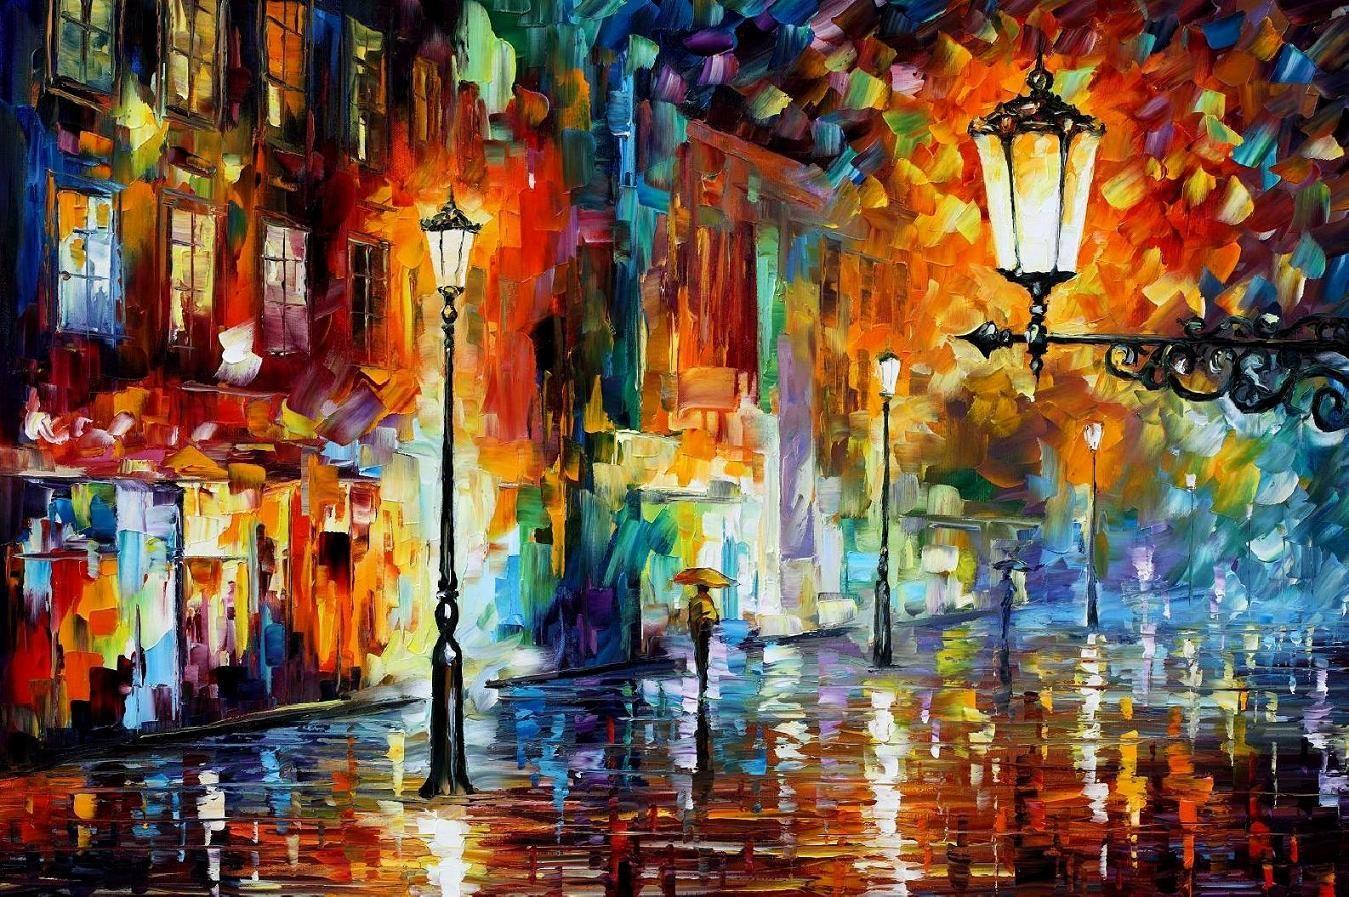 Leonid afremov paint oil impressionism abstract scape for Buy original art online